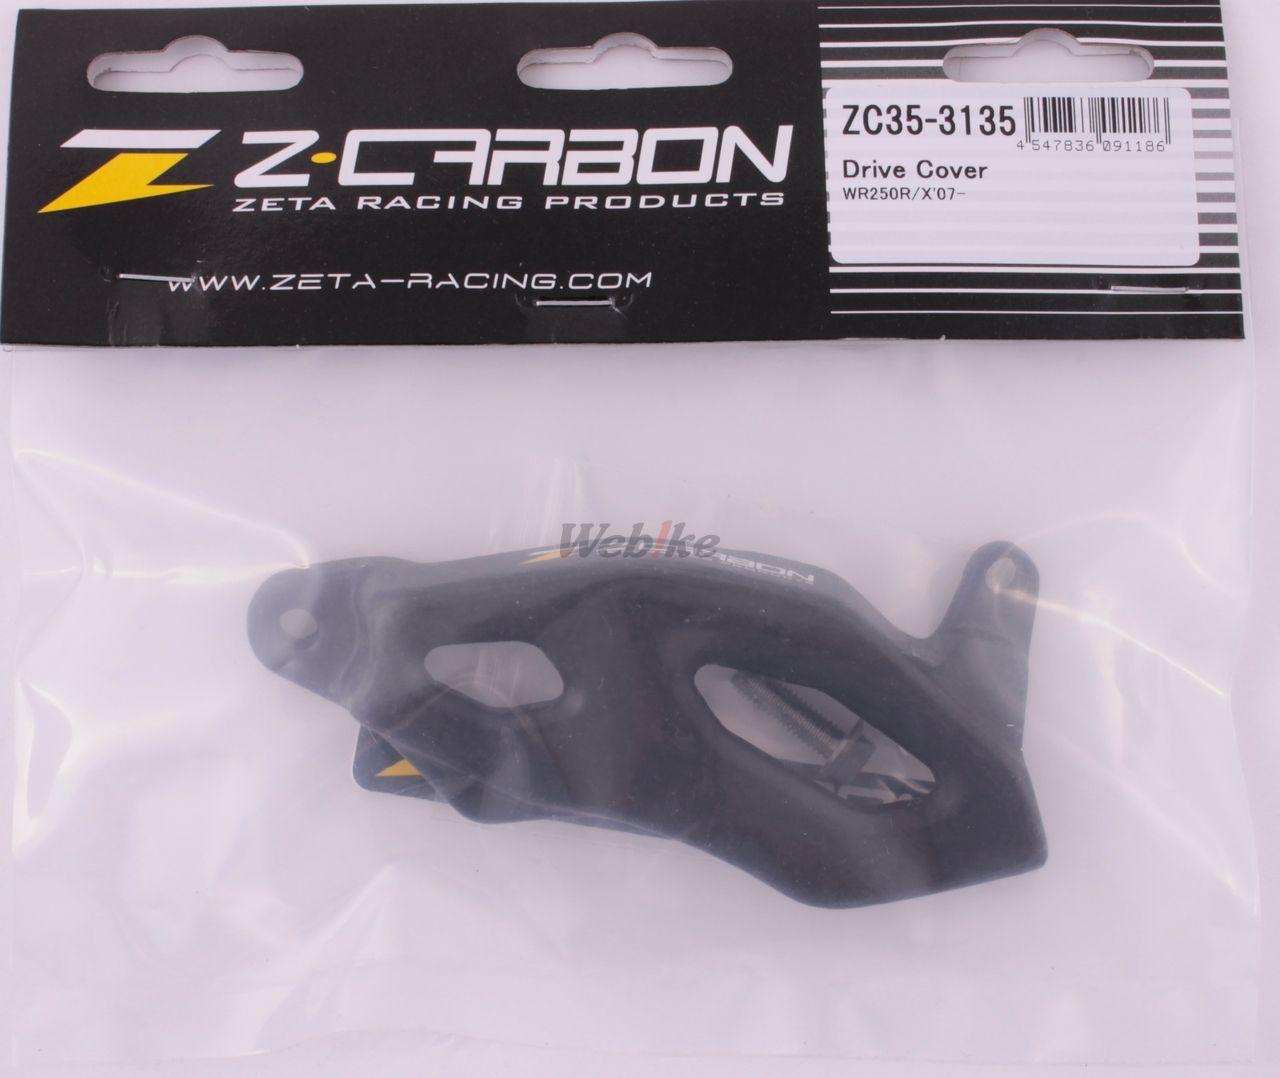 【ZETA】Z-Carbon 前齒盤外蓋 - 「Webike-摩托百貨」